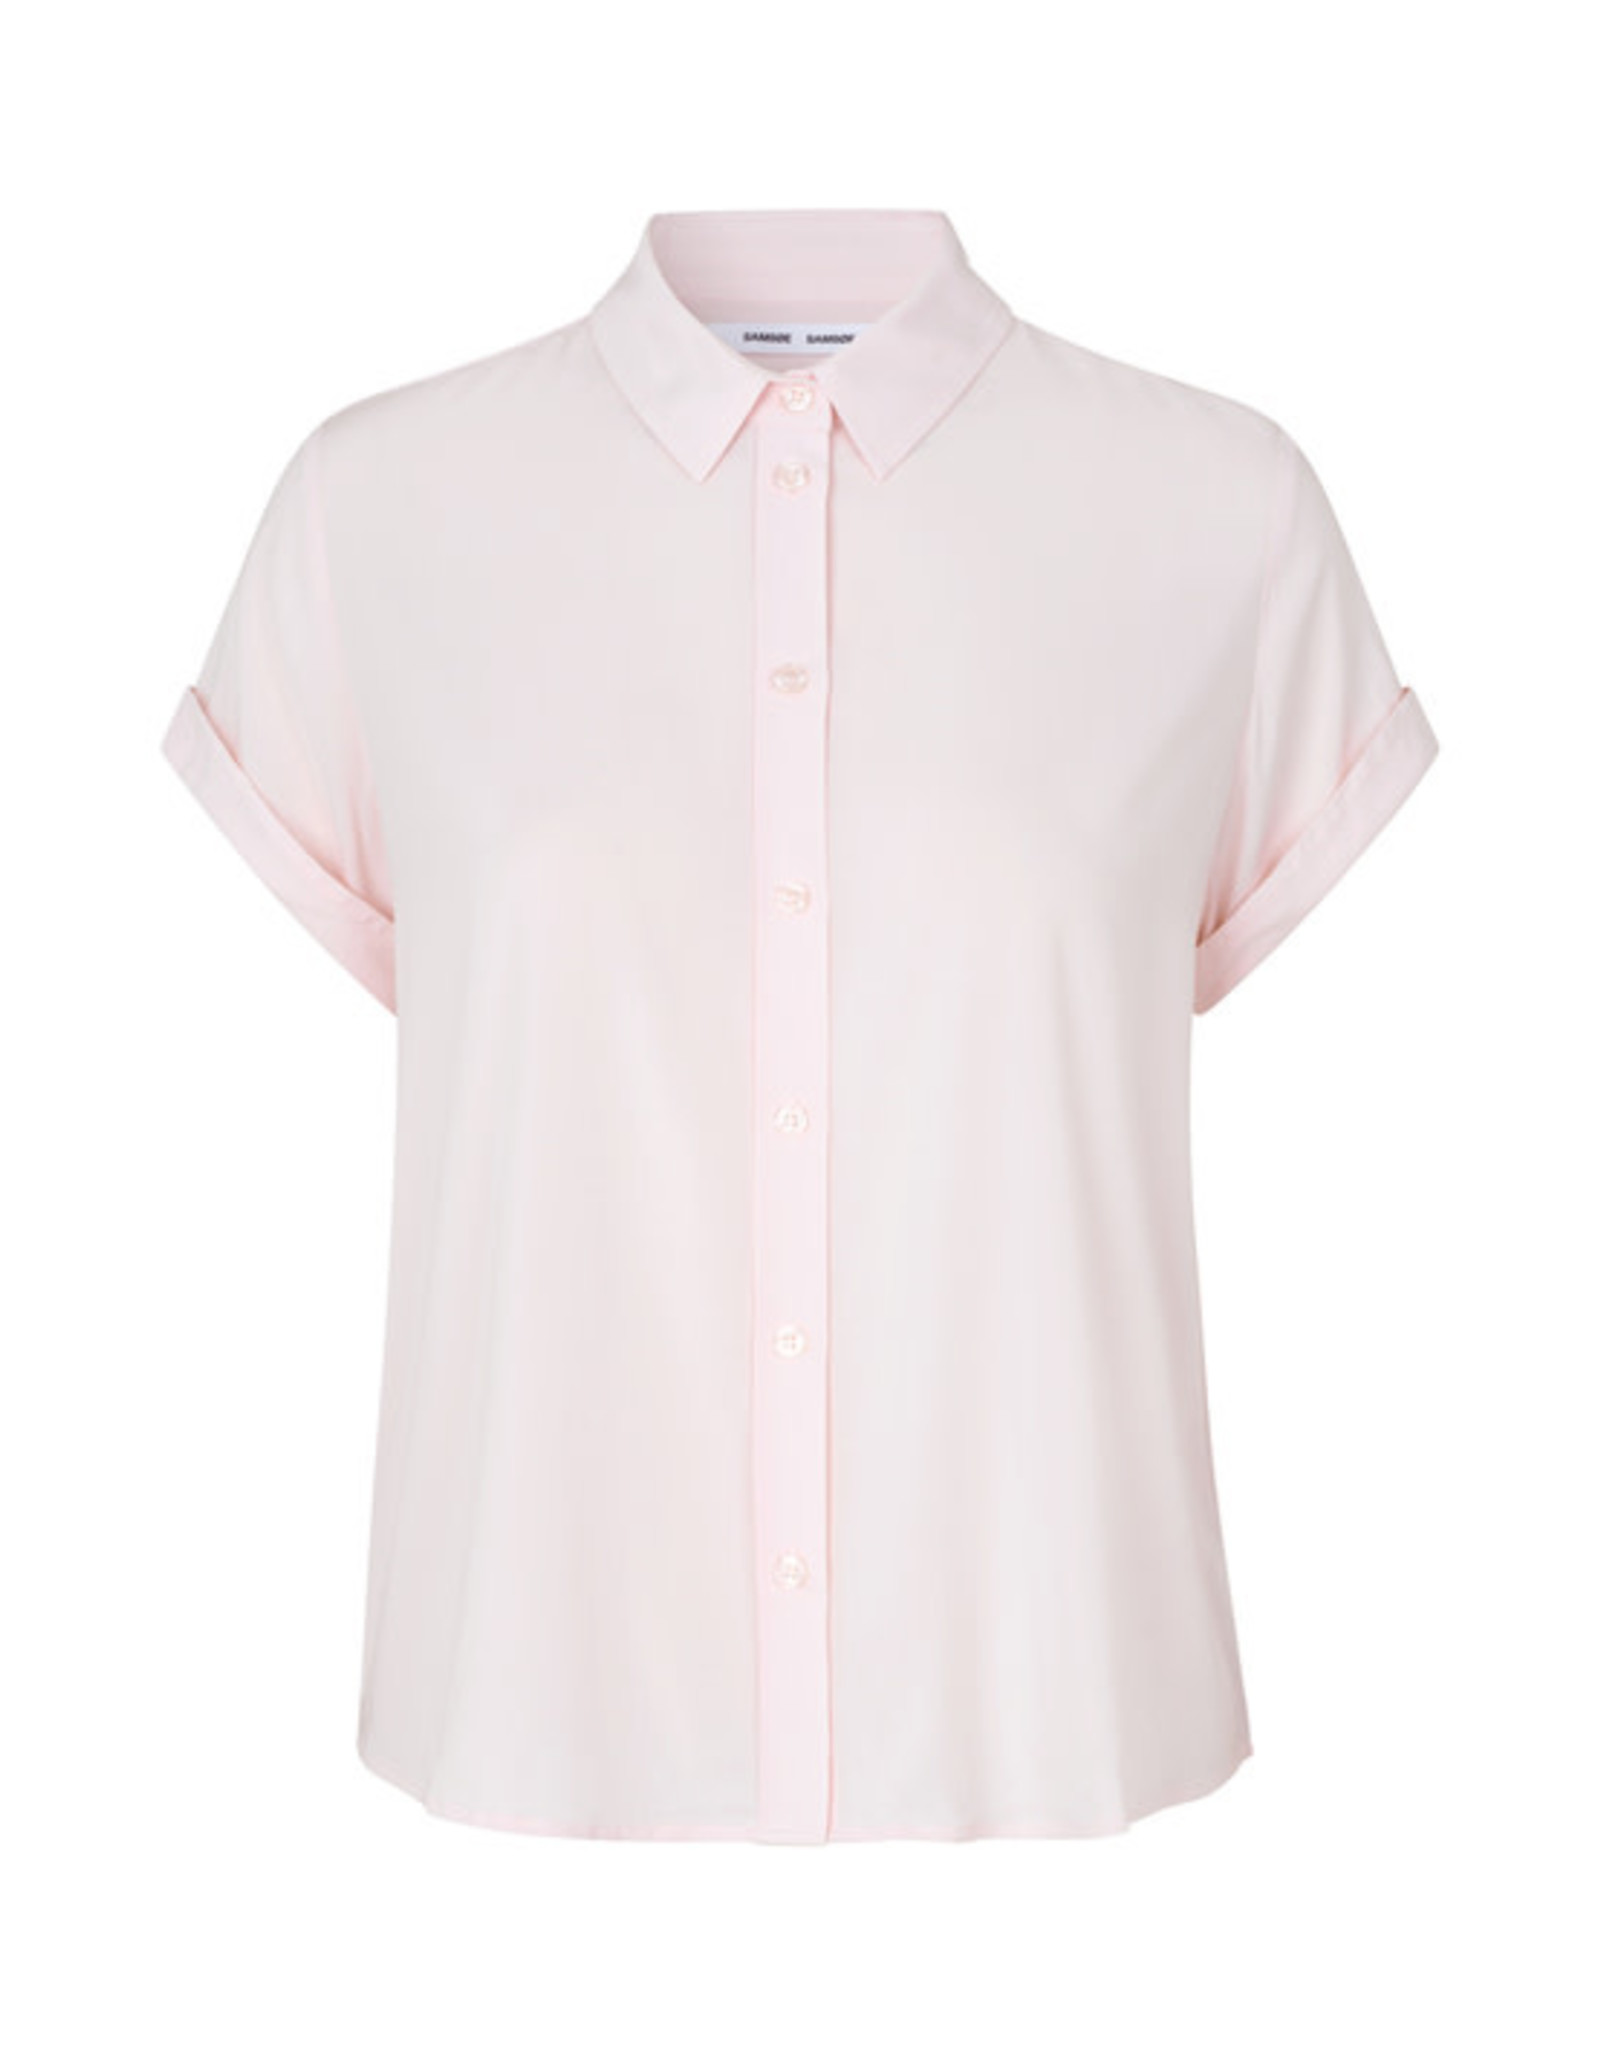 Samsoe Samsoe Majan ss shirt CRYSTAL PINK